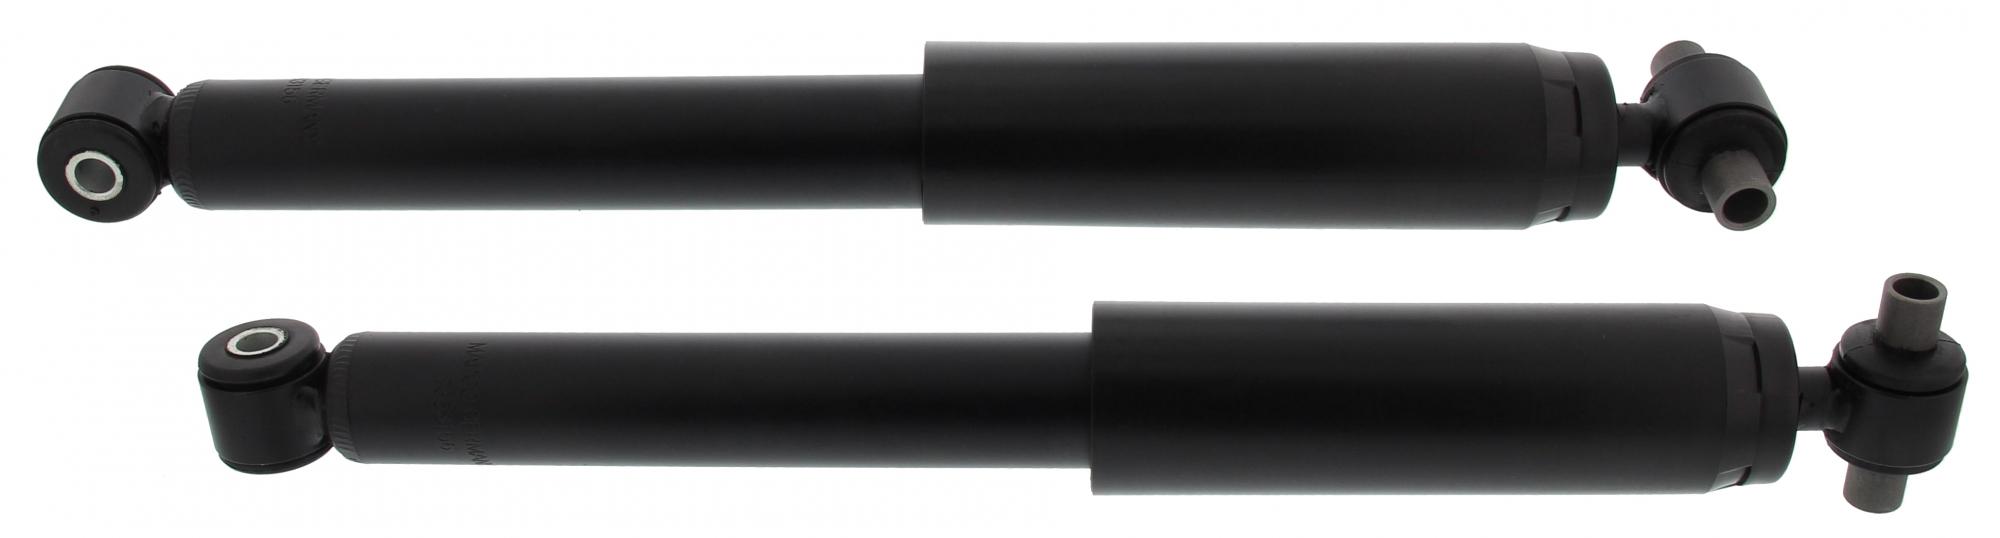 MAPCO 40616/2 Stoßdämpfer Hinterachse